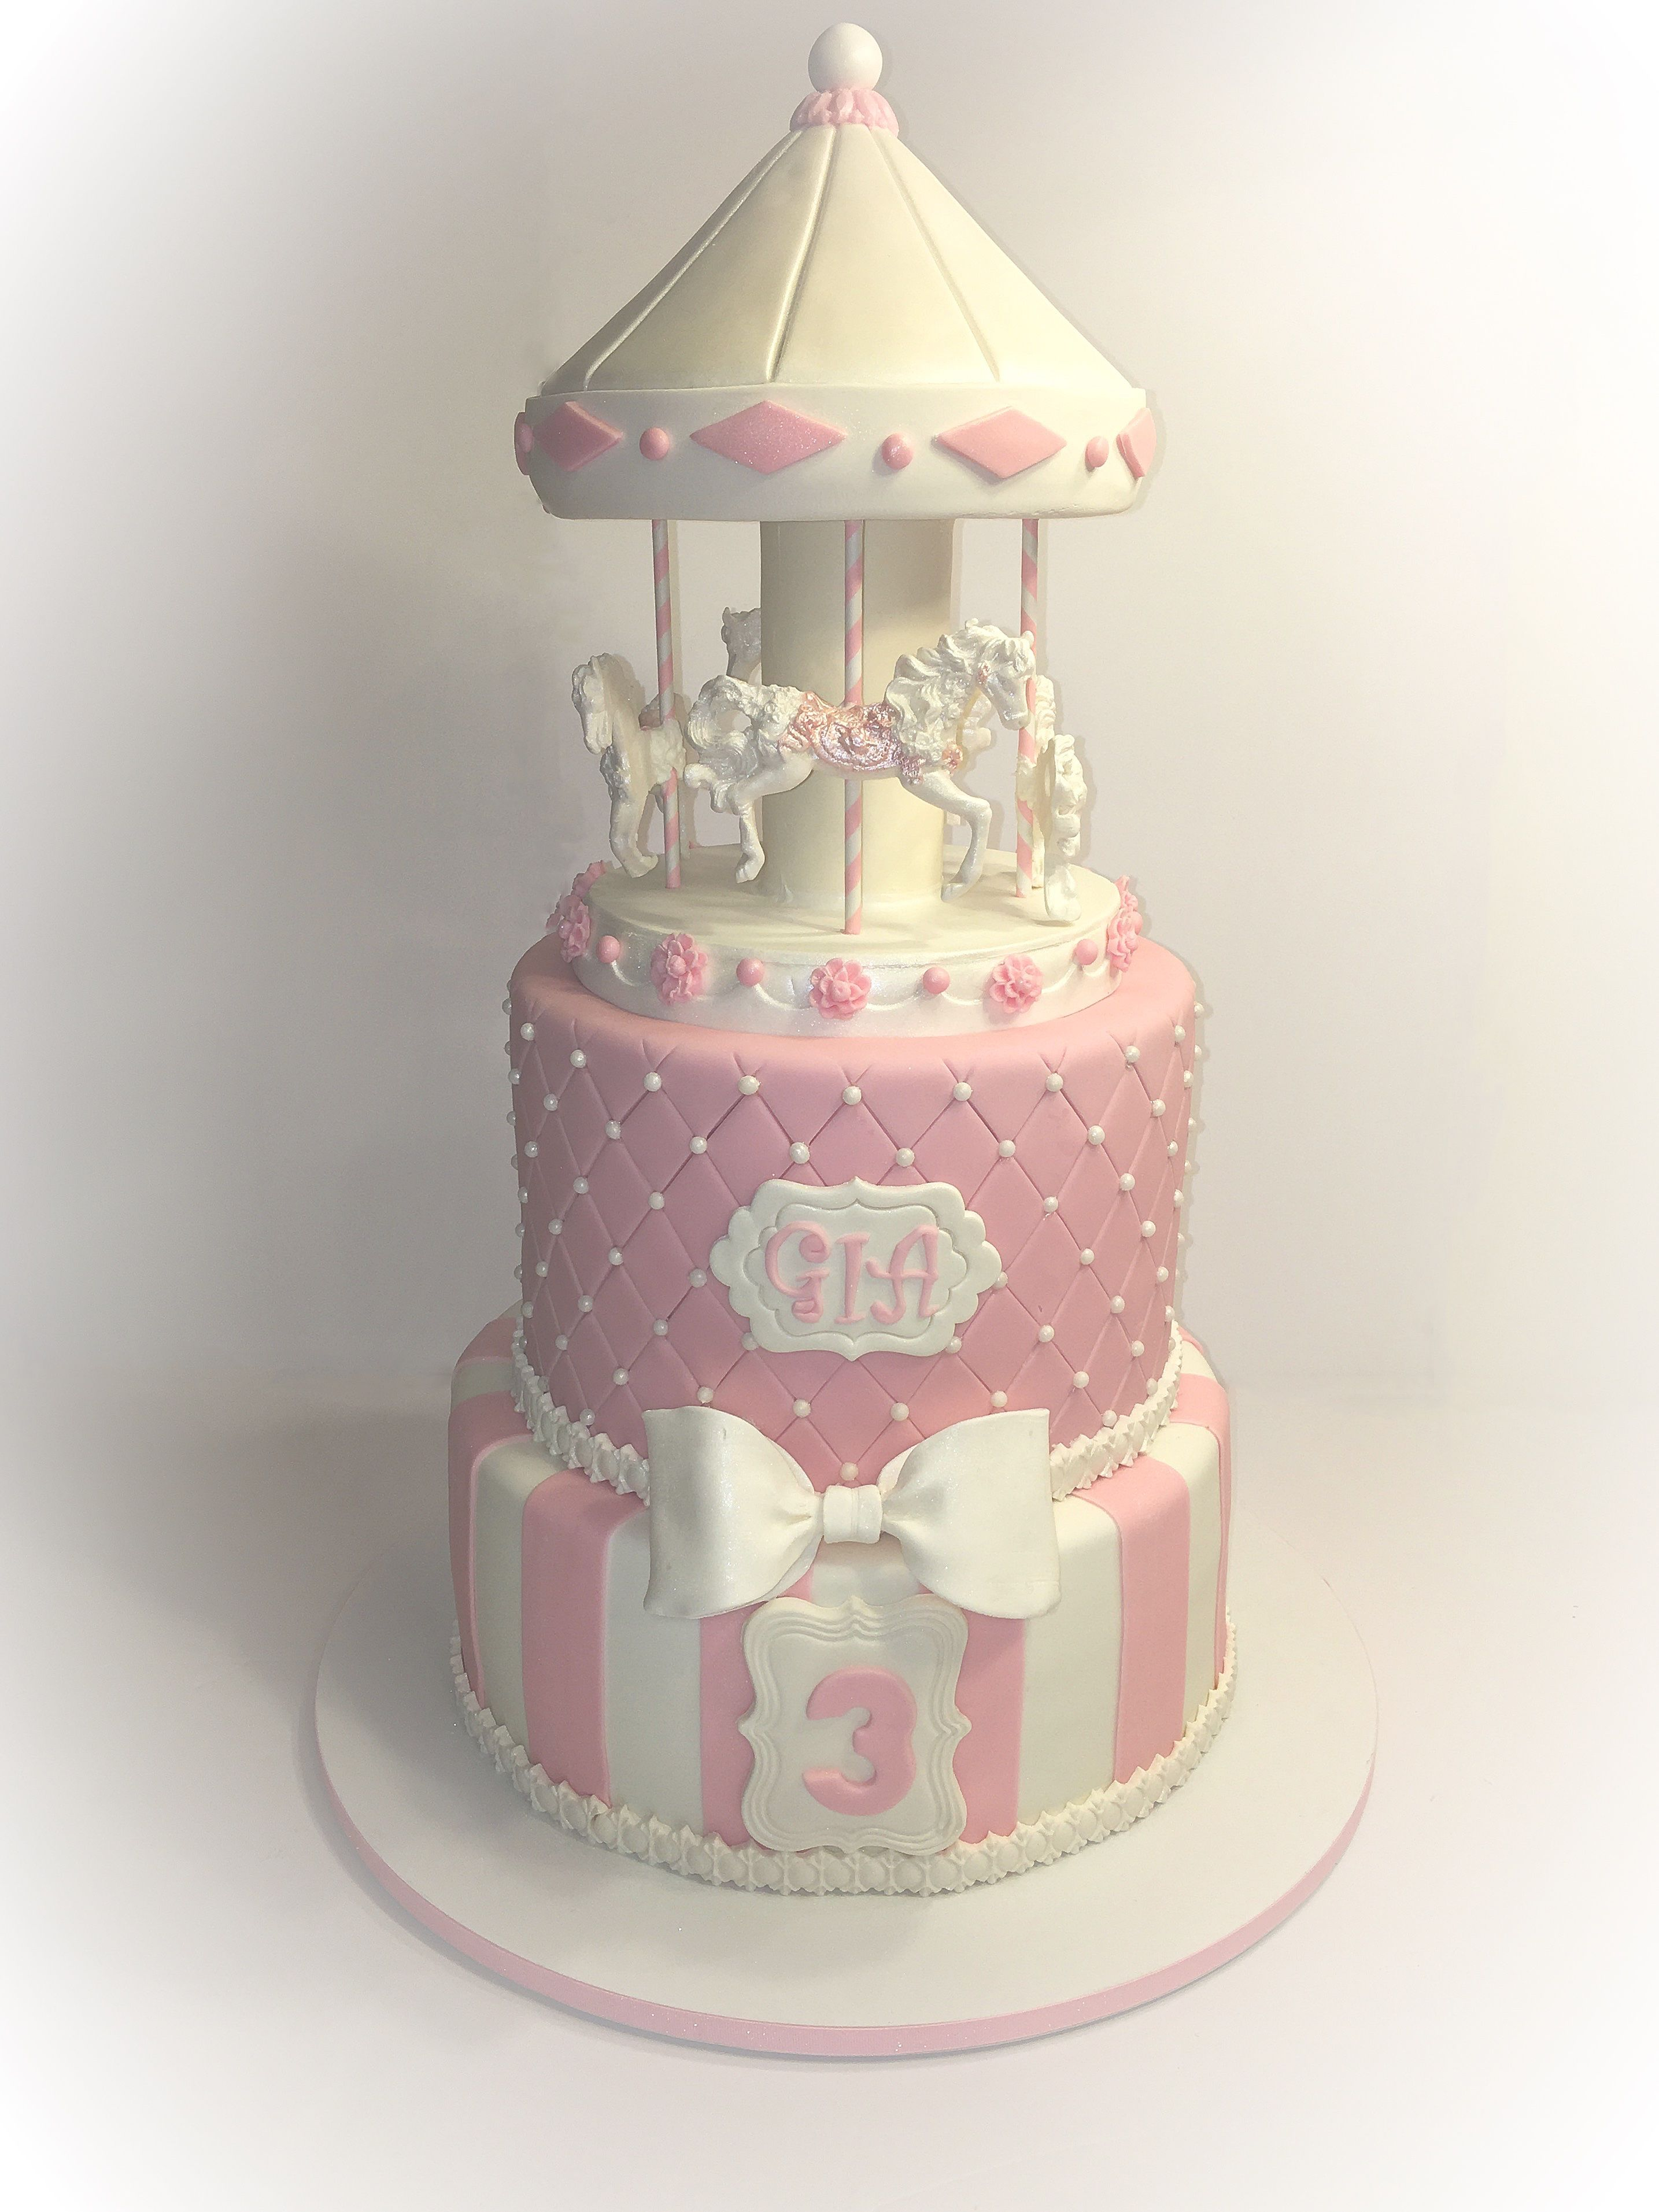 Carousel Birthday Cake Cakes Pinterest Carousel Birthday